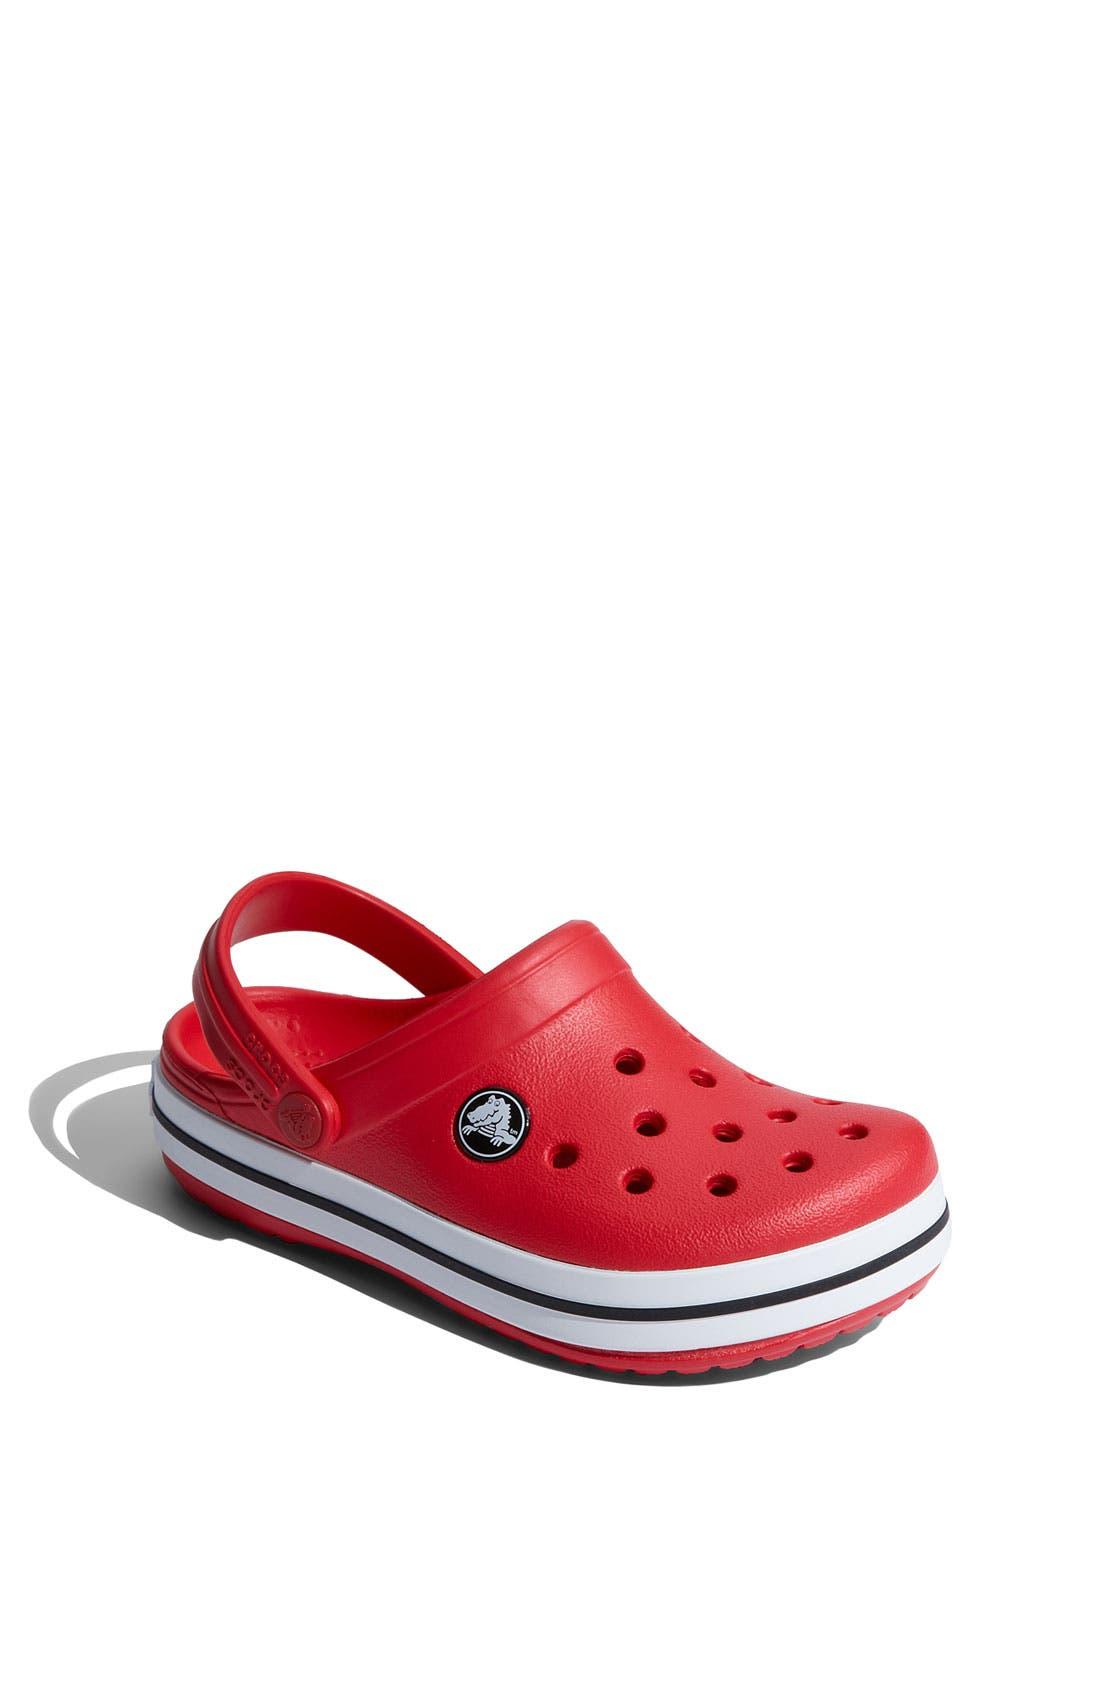 Alternate Image 1 Selected - CROCS™ 'Crocband' Slip-On (Walker, Toddler & Little Kid)